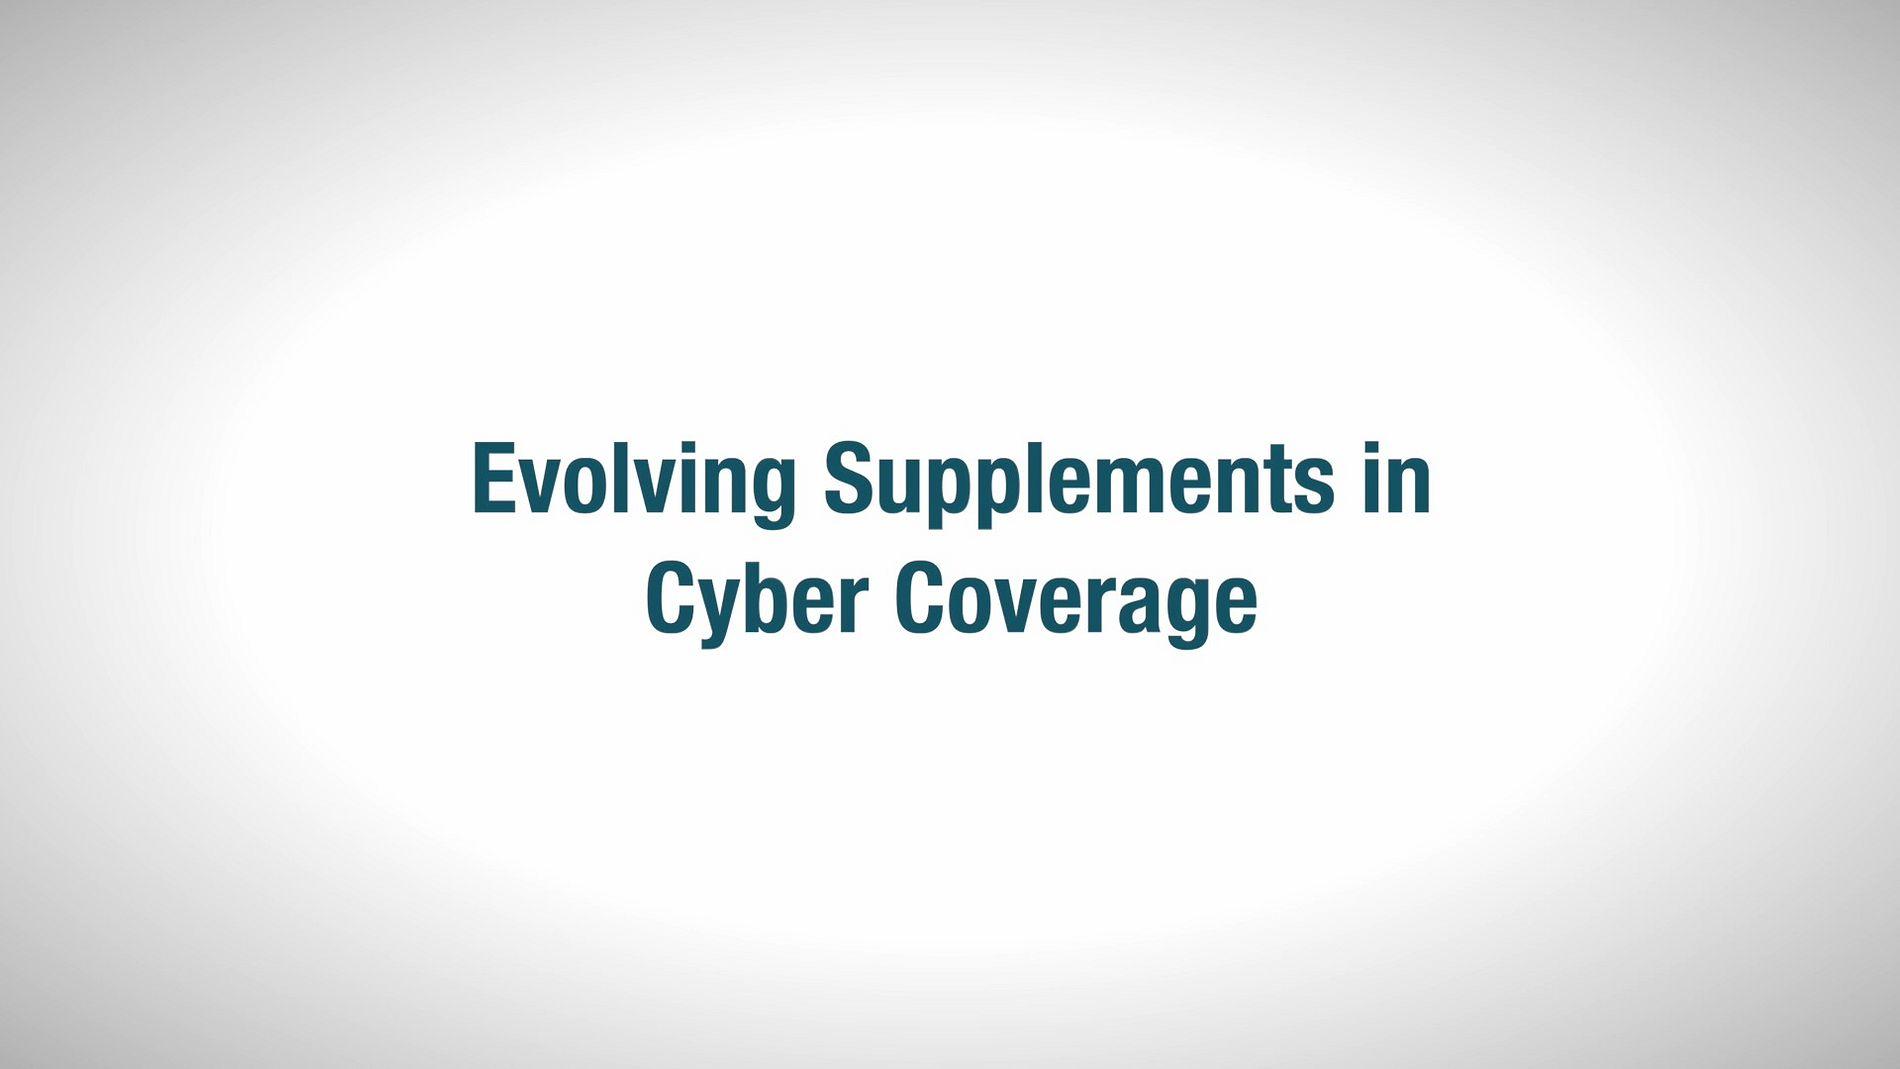 Evolving Cyber Coverage Video